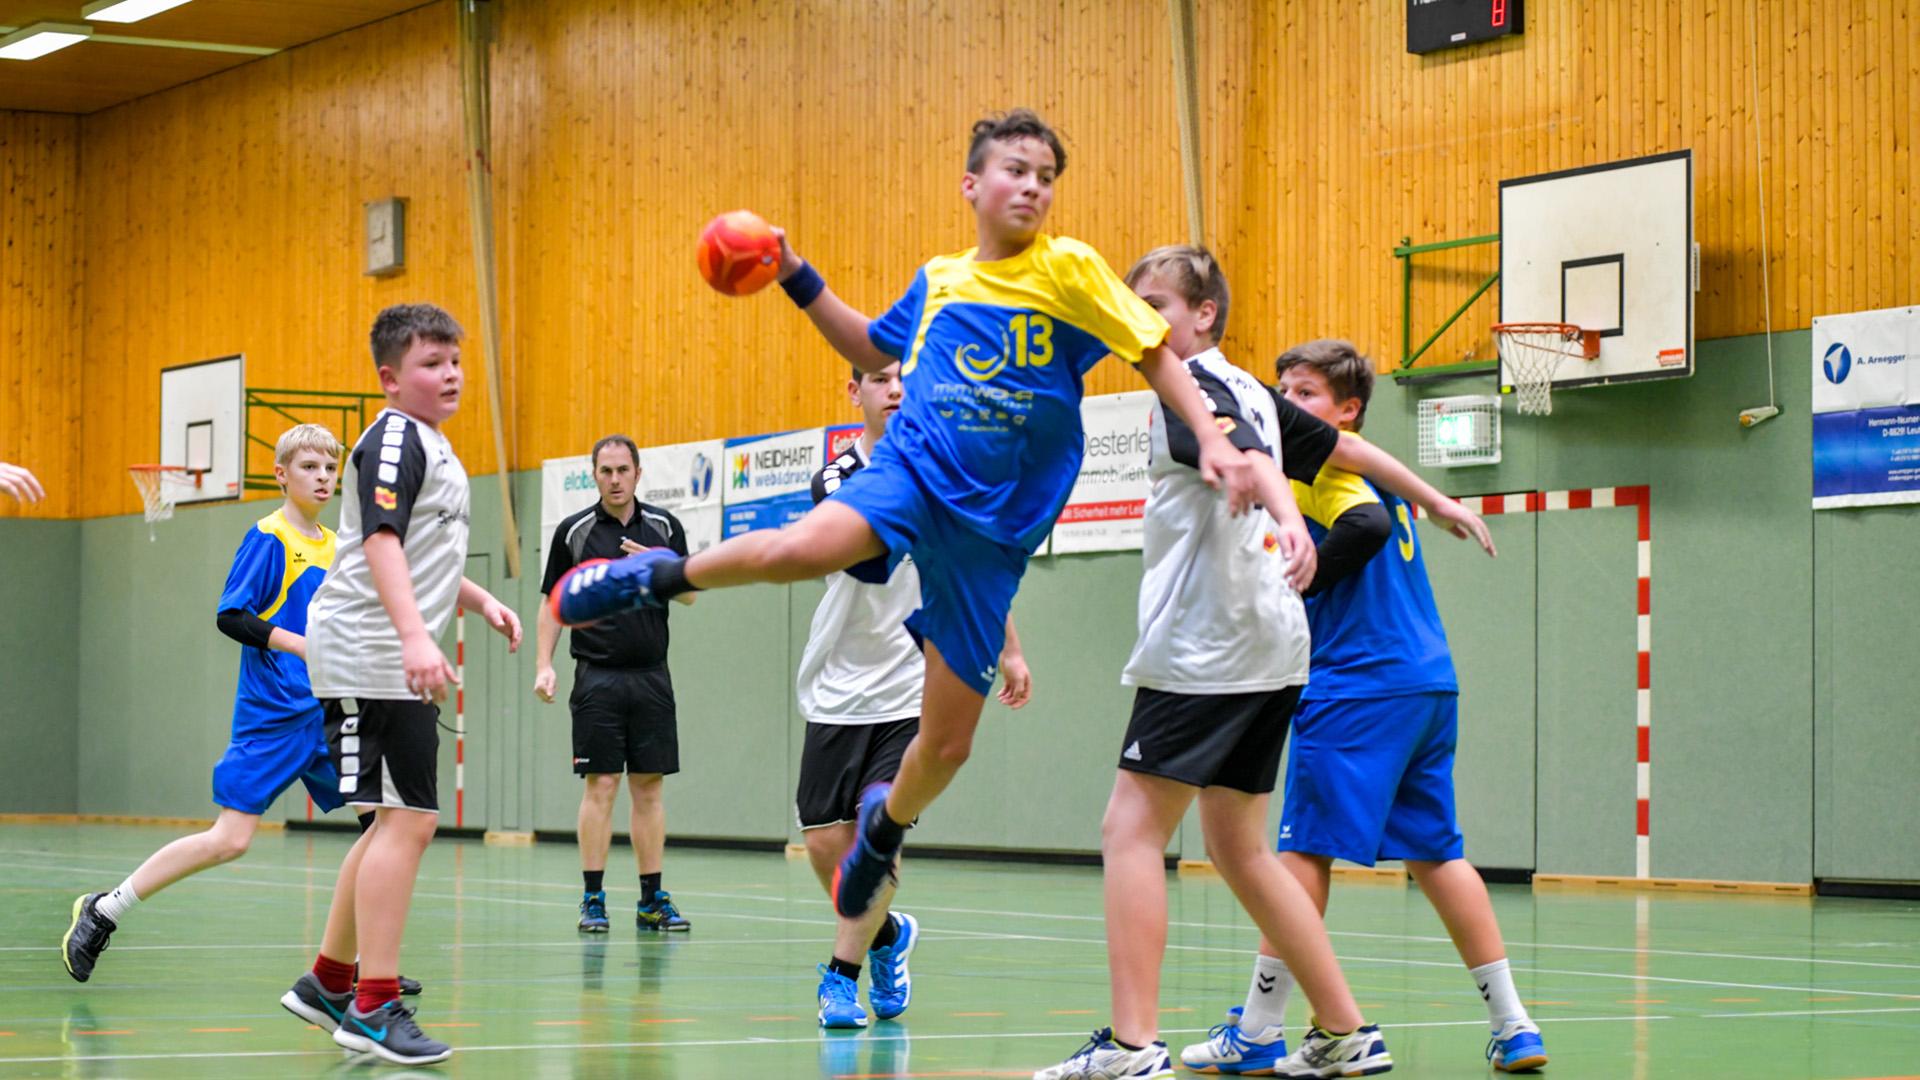 097Slider_mC_tsg_leutkirch_handball